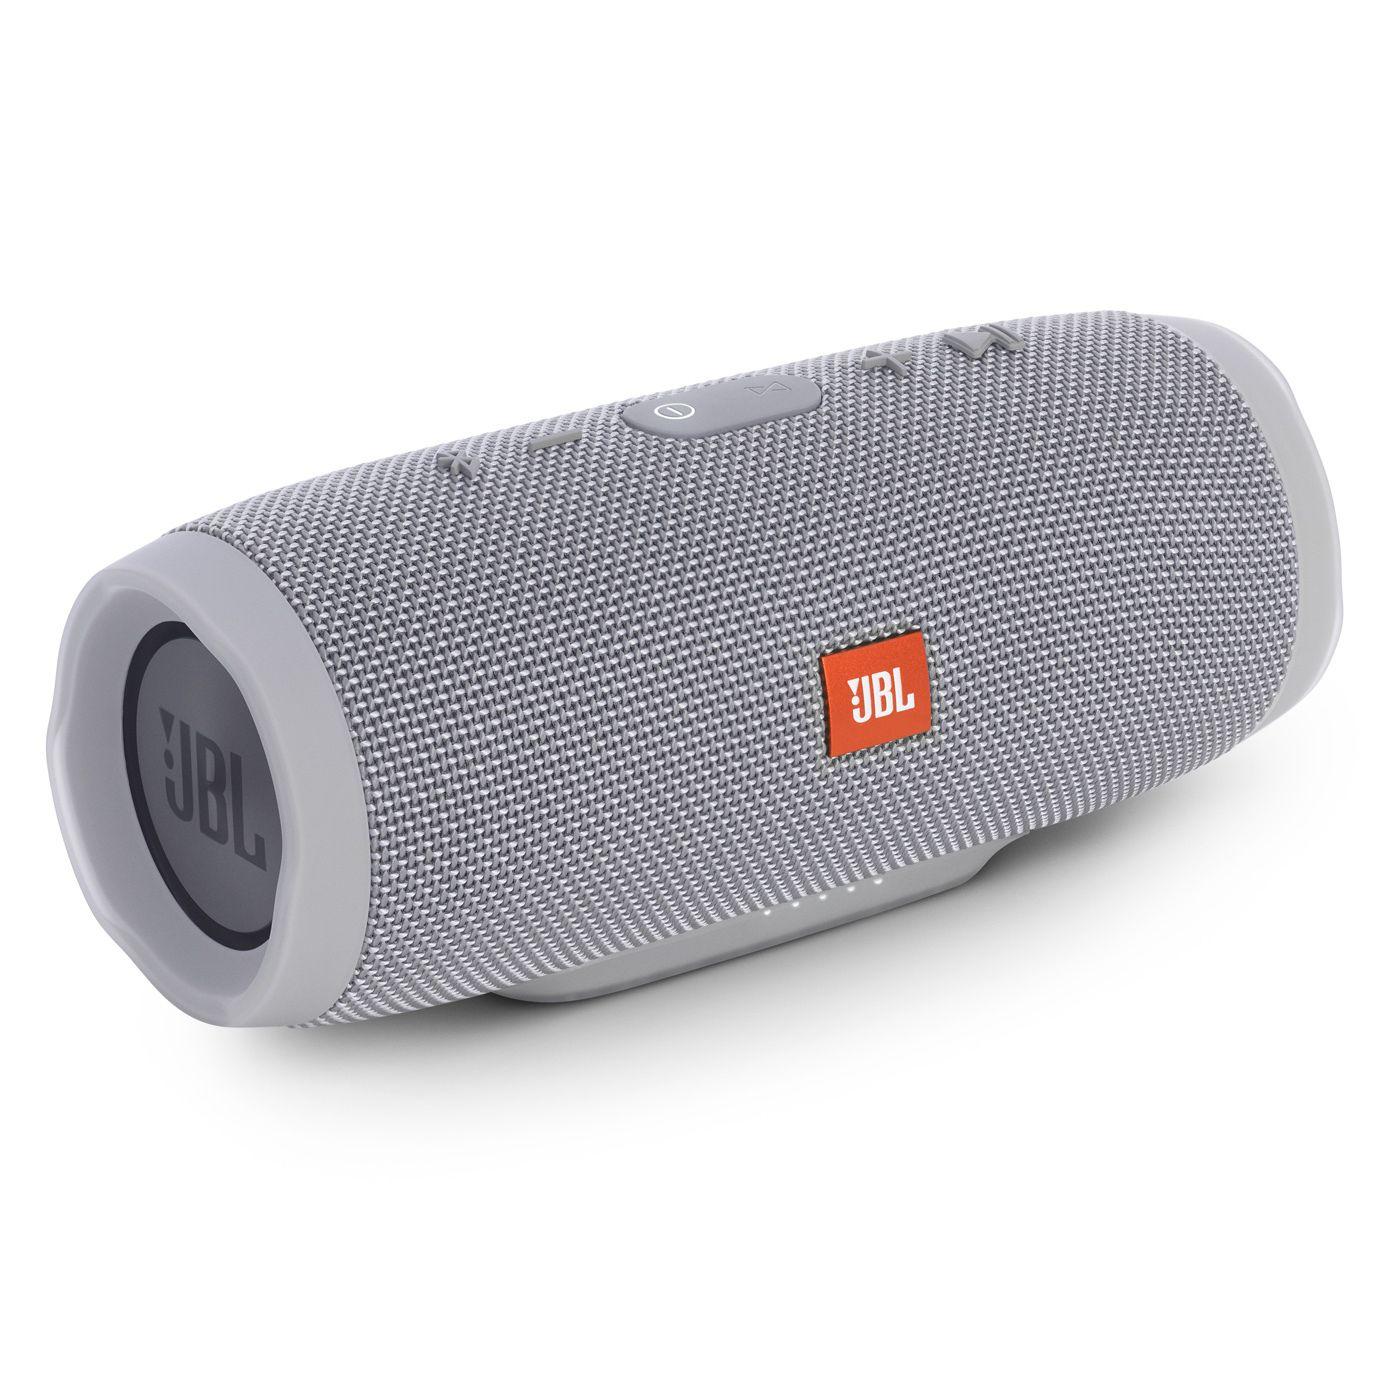 Jbl Bluetooth Speaker Portable Manufacturers Flip Iii Pink Charge 3